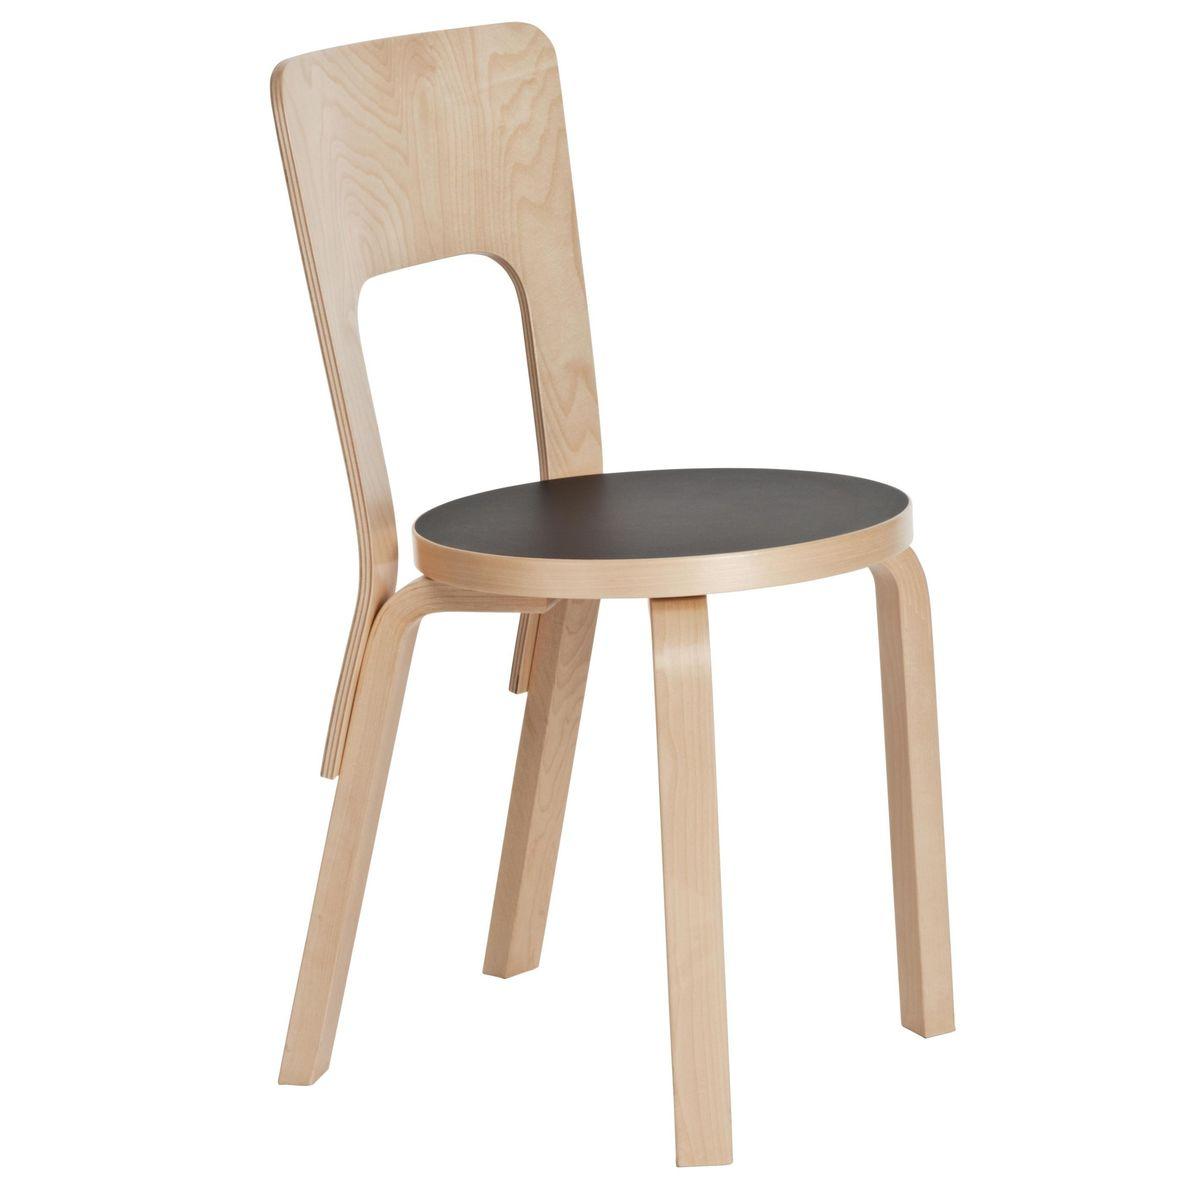 Stuhl zeichnung  Artek 66 Stuhl | Artek | AmbienteDirect.com